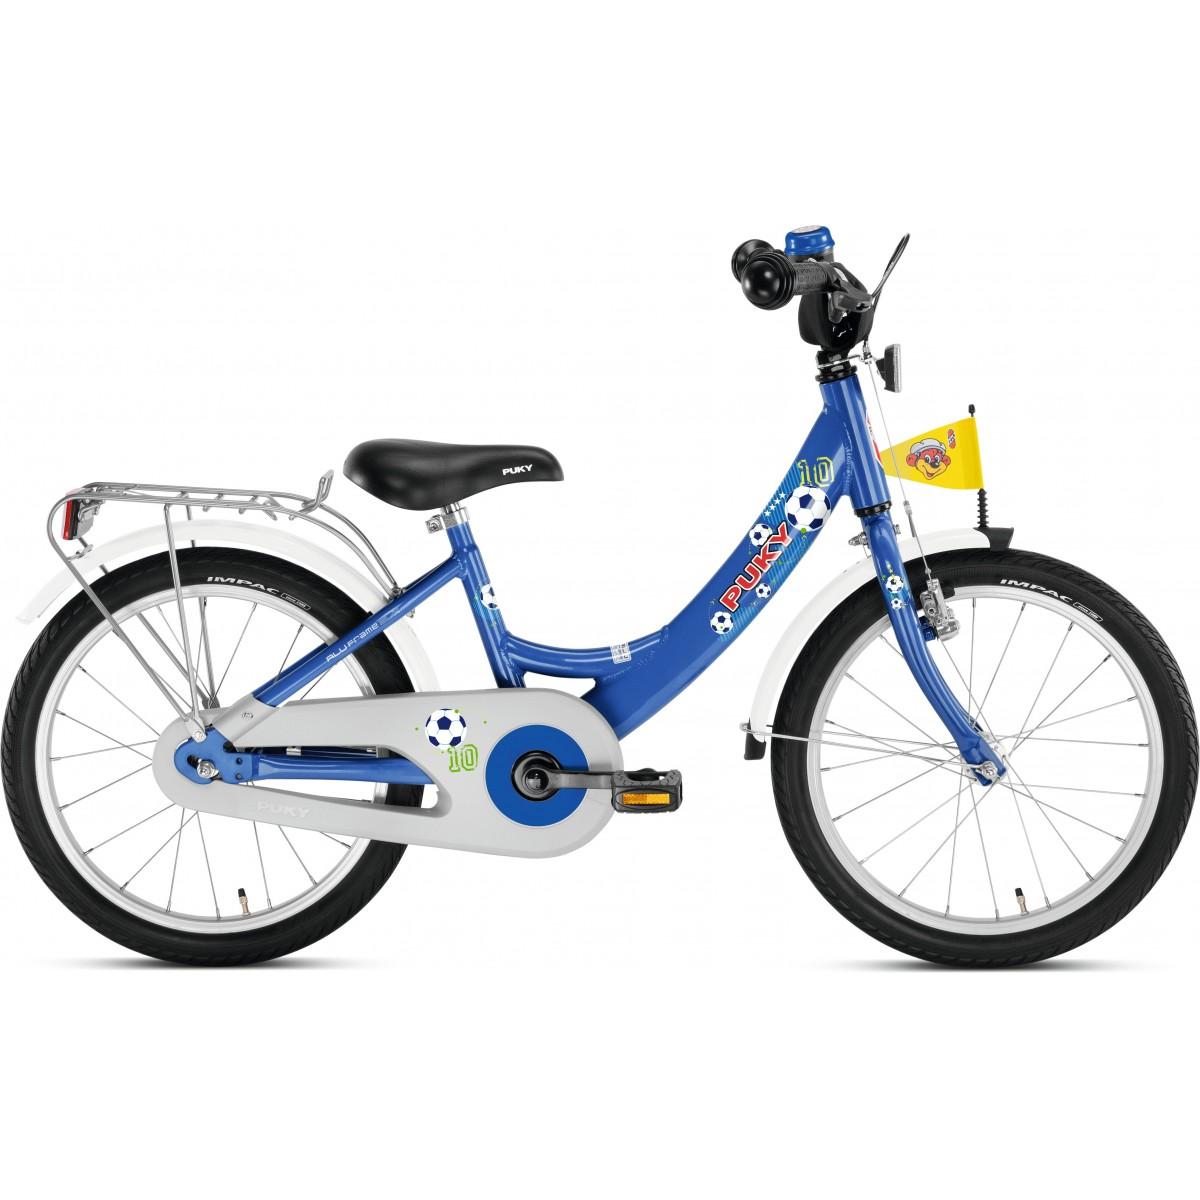 Puky Fahrrad Lenker Verstellen